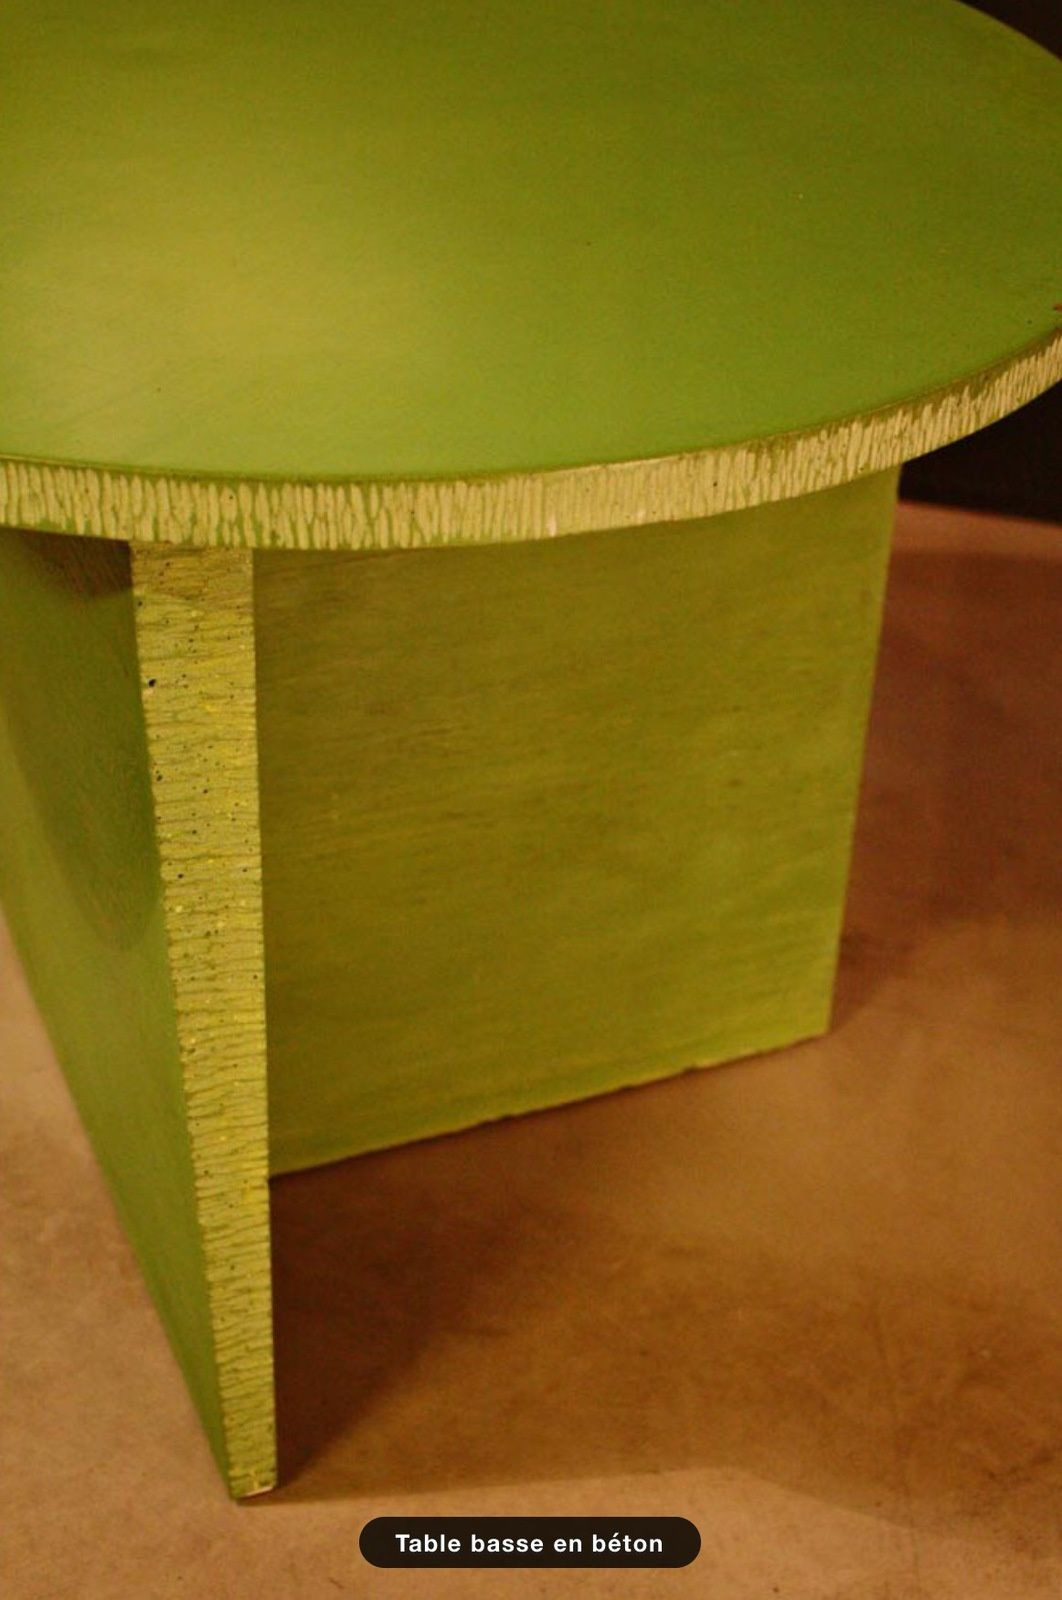 Table basse en béton